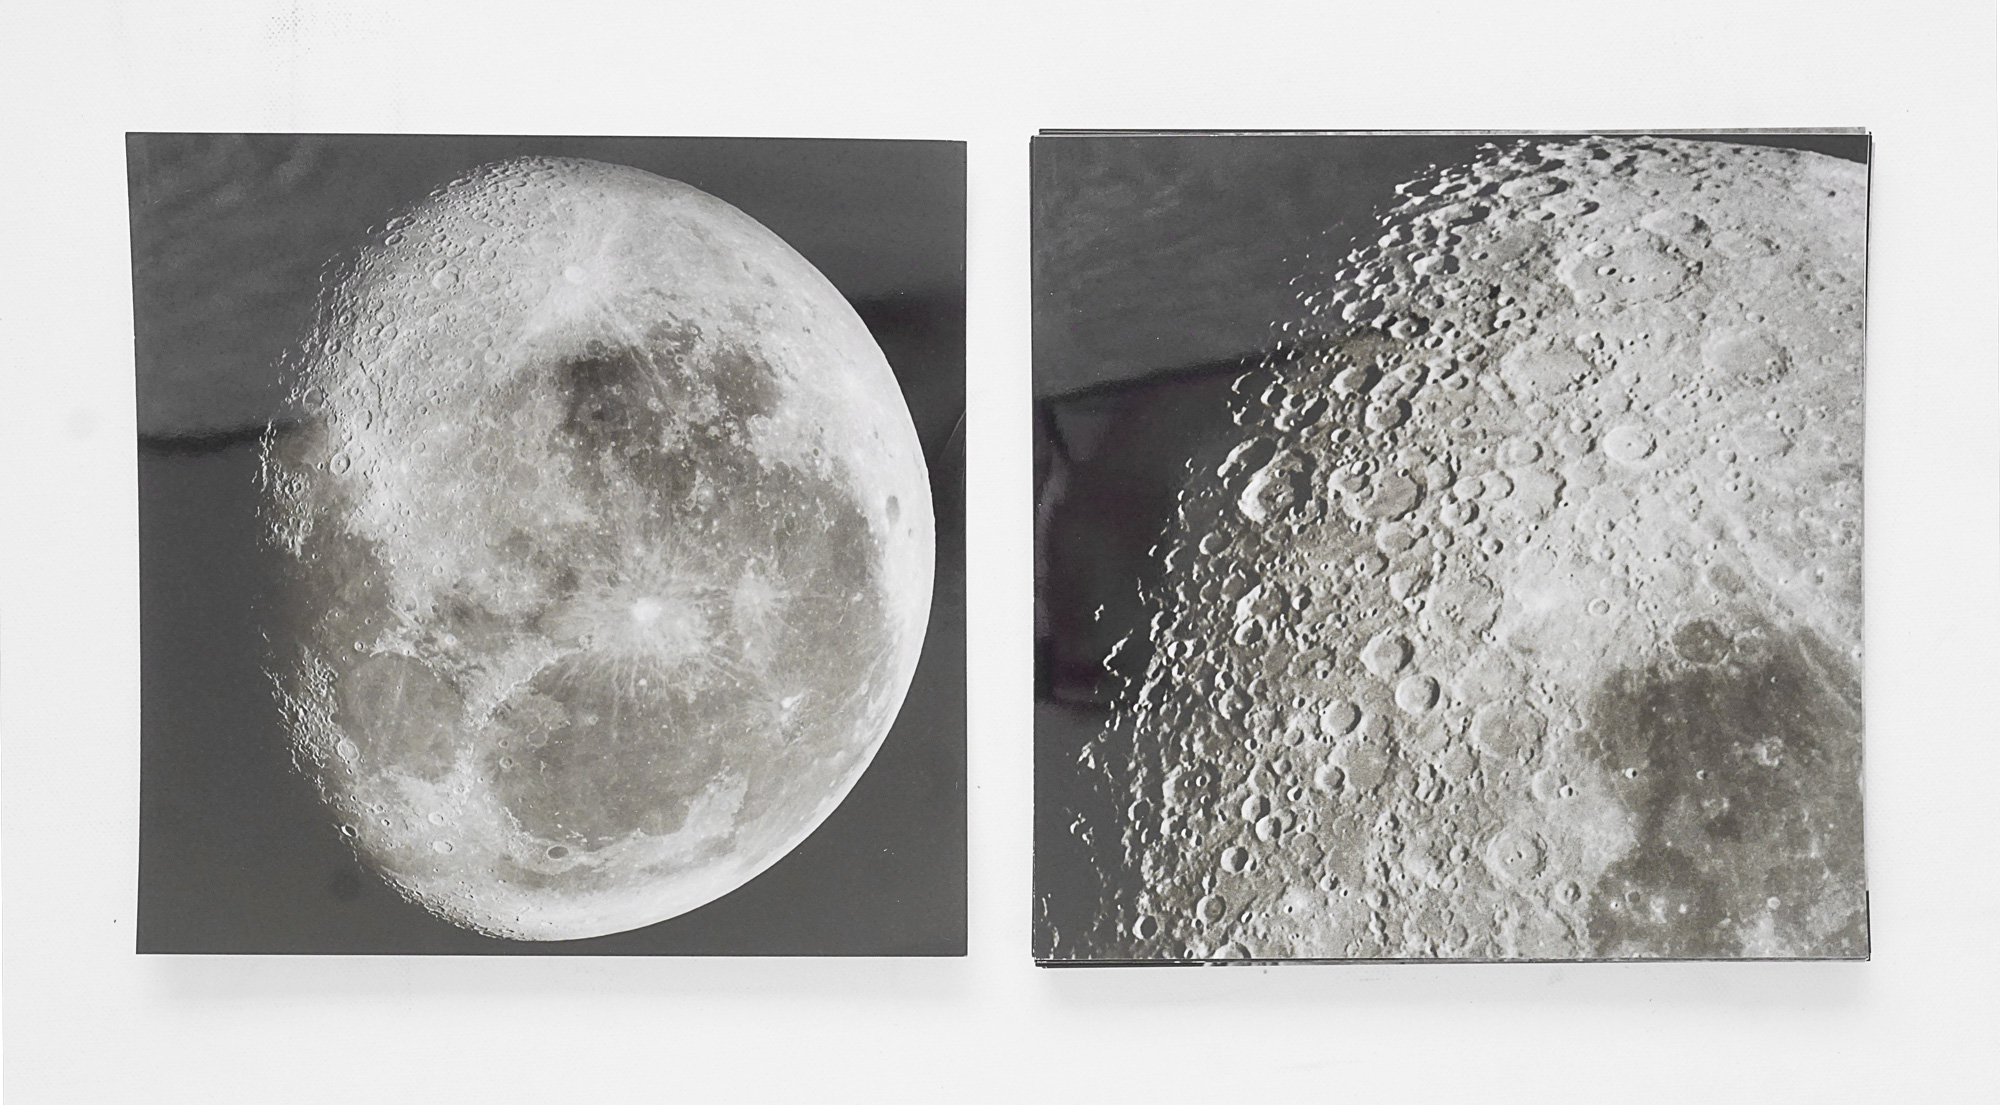 Berliner Mond-Atlas